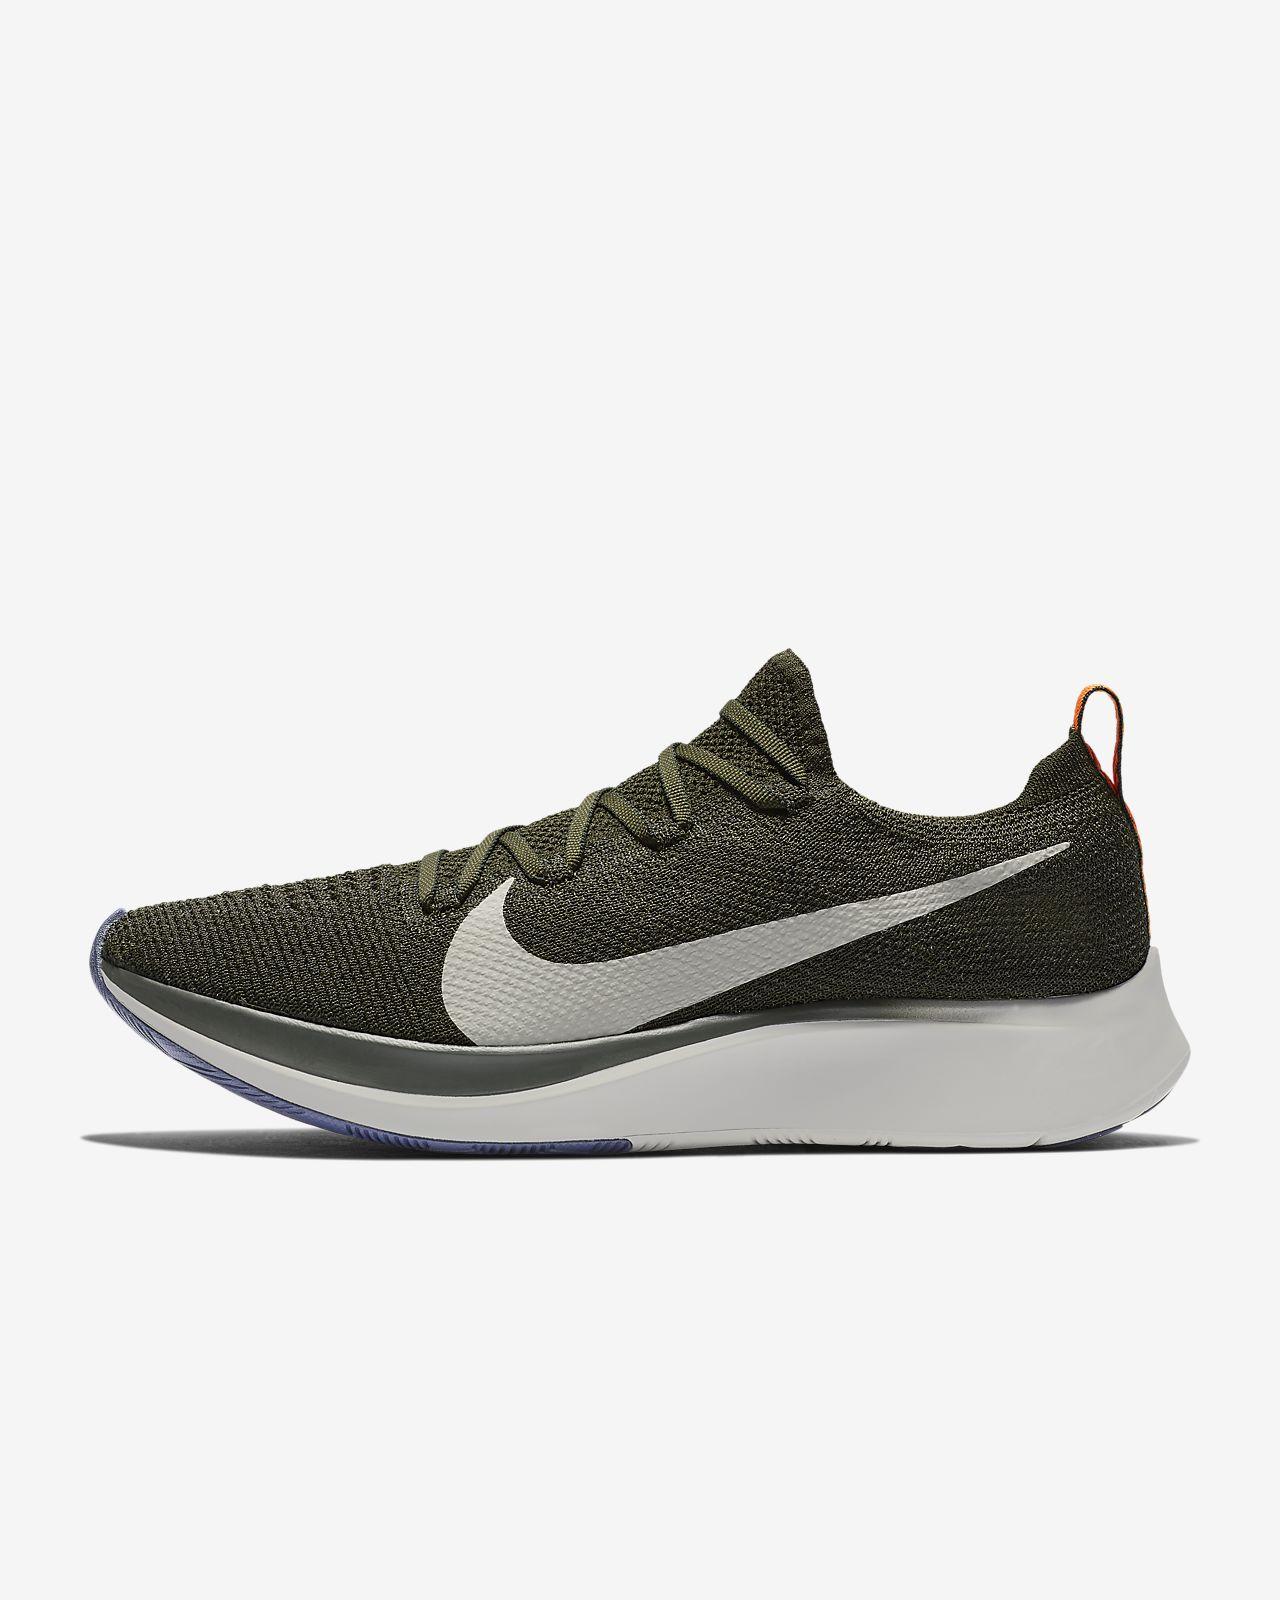 ba3d35cf28c Nike Zoom Fly Flyknit Men s Running Shoe. Nike.com DK